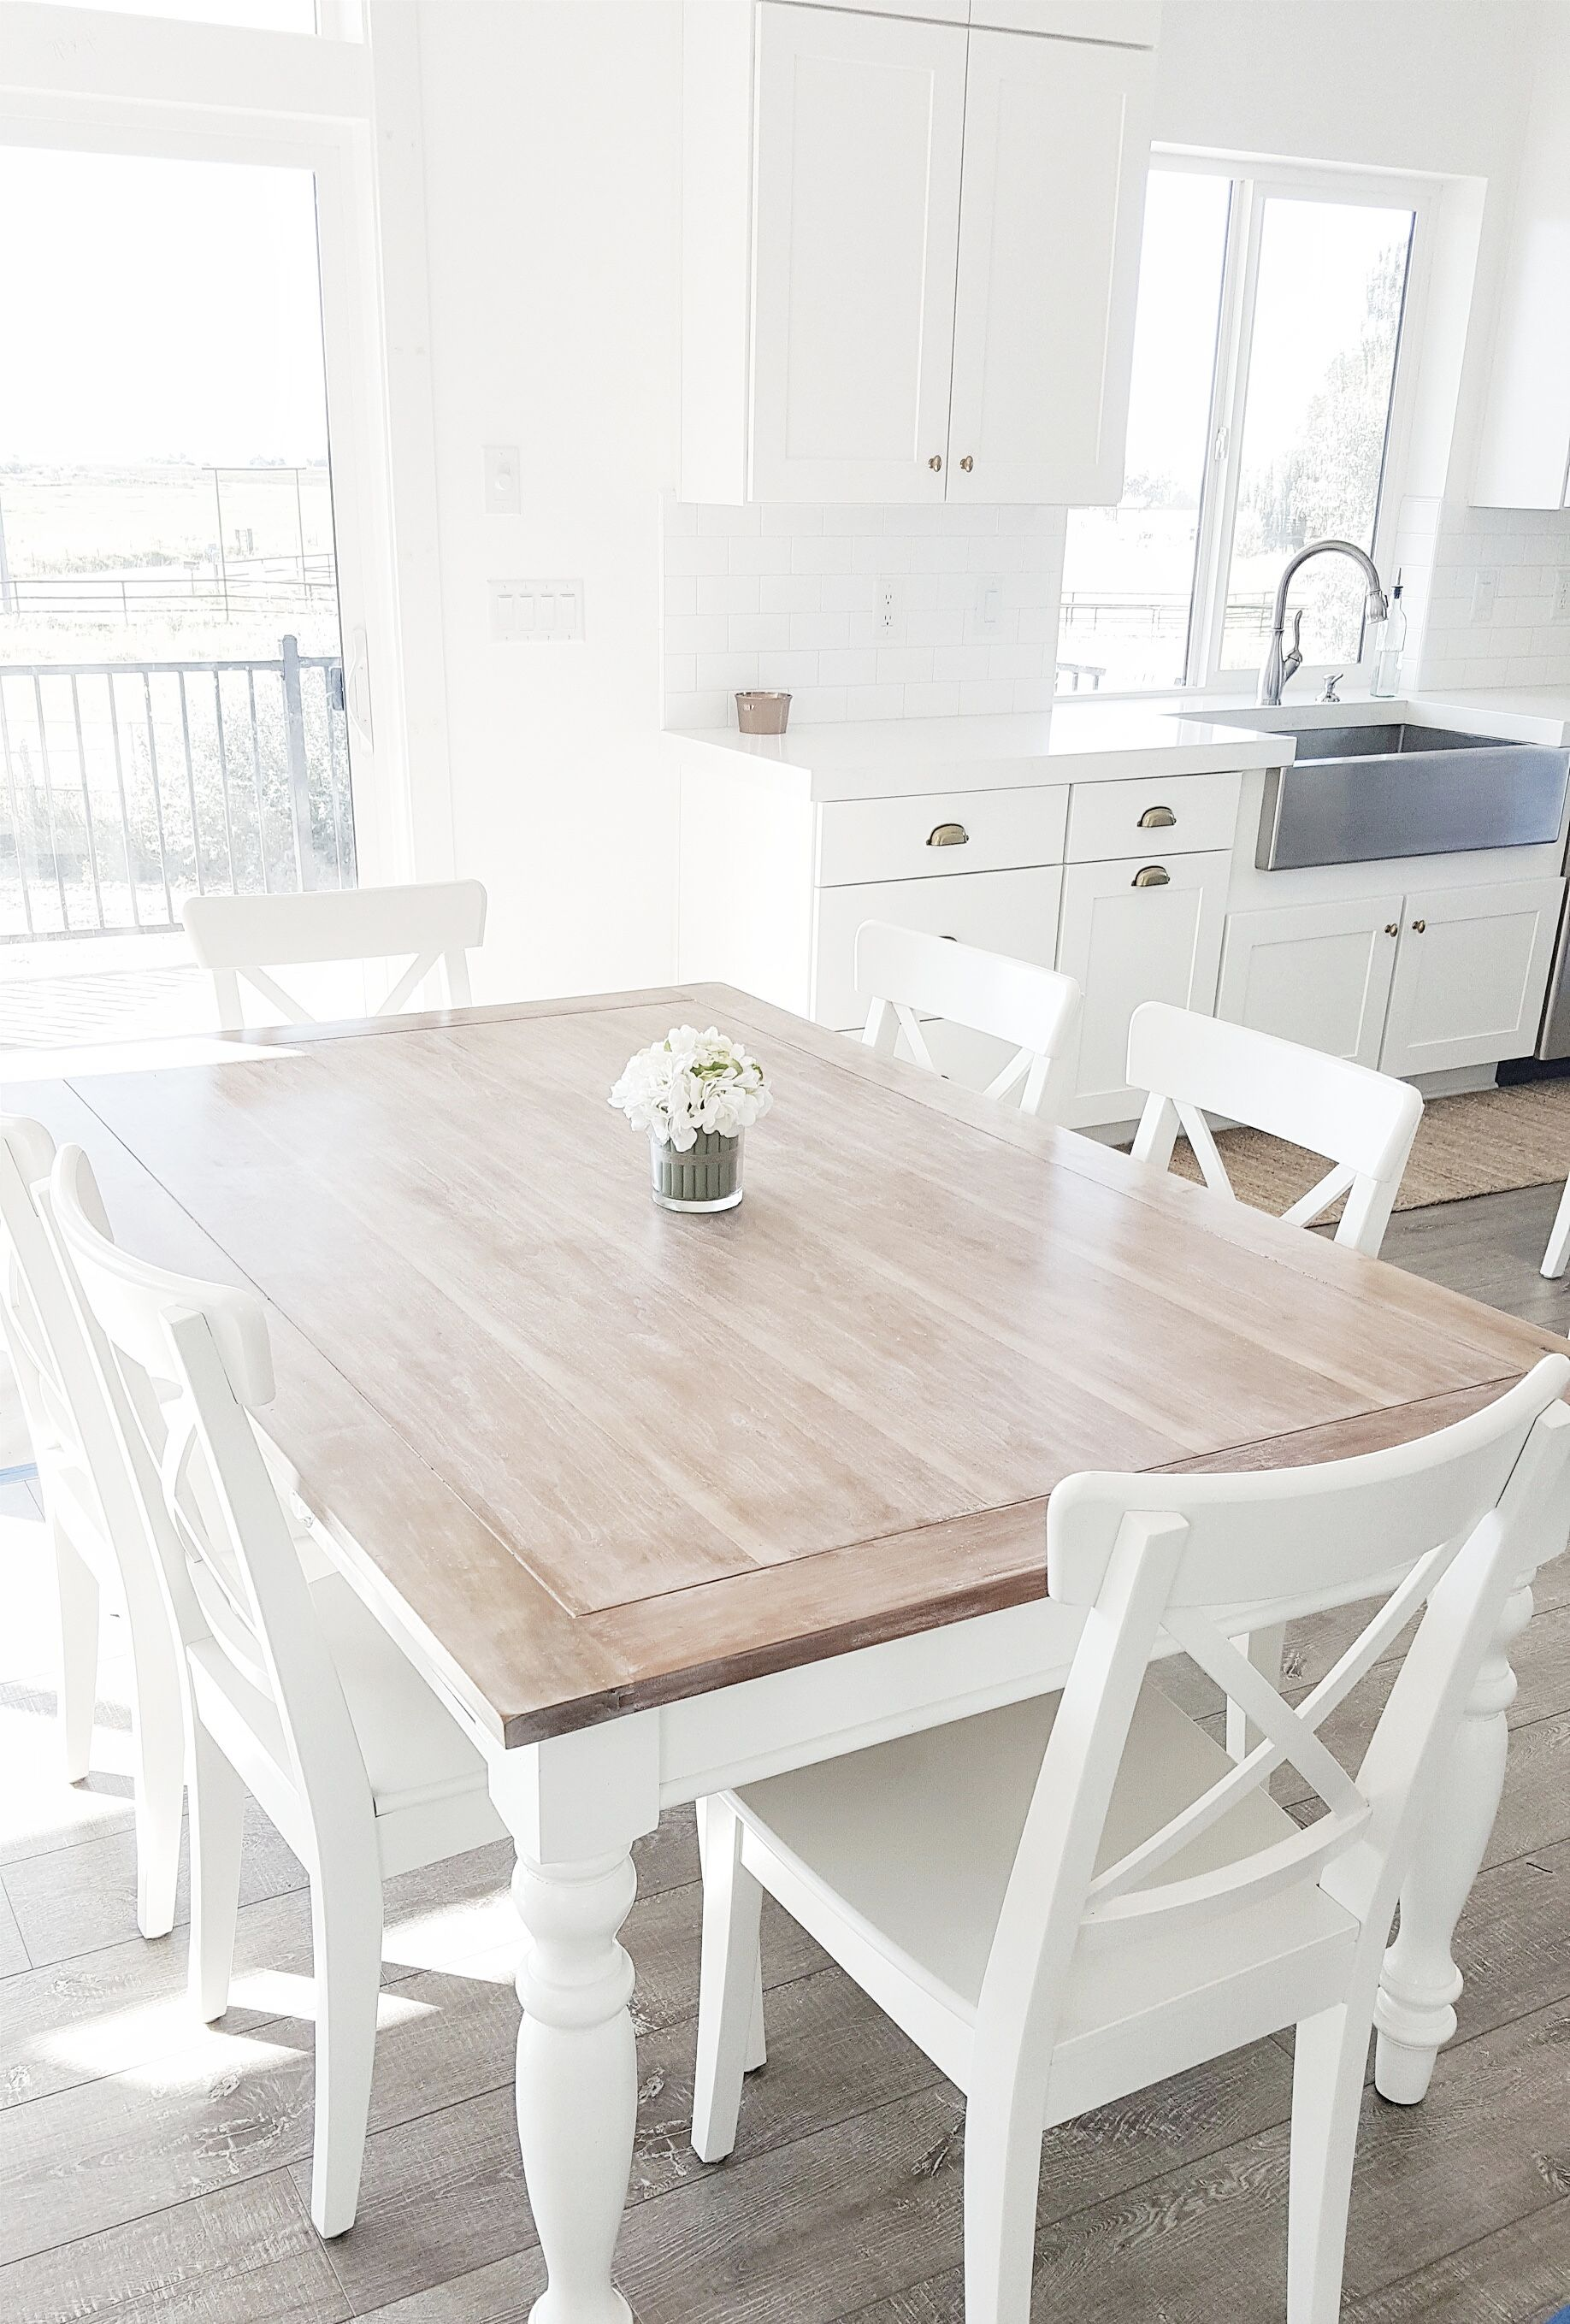 white dining table #whitelanedecor @whitelanedecor dining table, lime wax table top, stainless steel EUYFUZQ